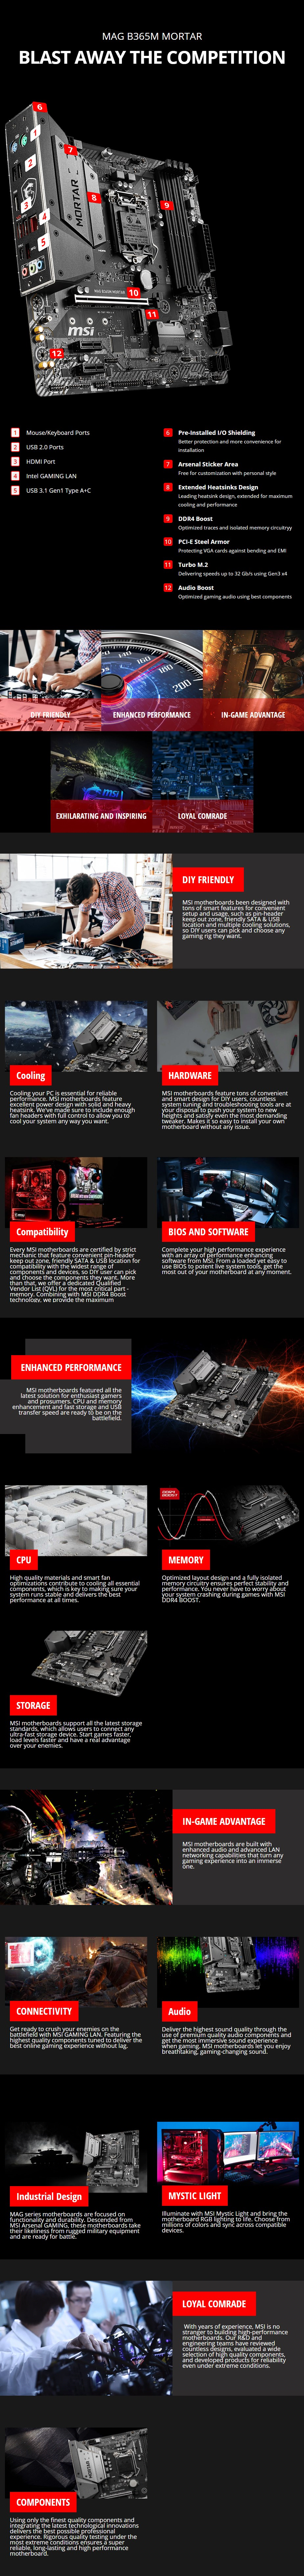 MSI MAG B365M MORTAR LGA 1151 Micro-ATX Motherboard - Overview 1